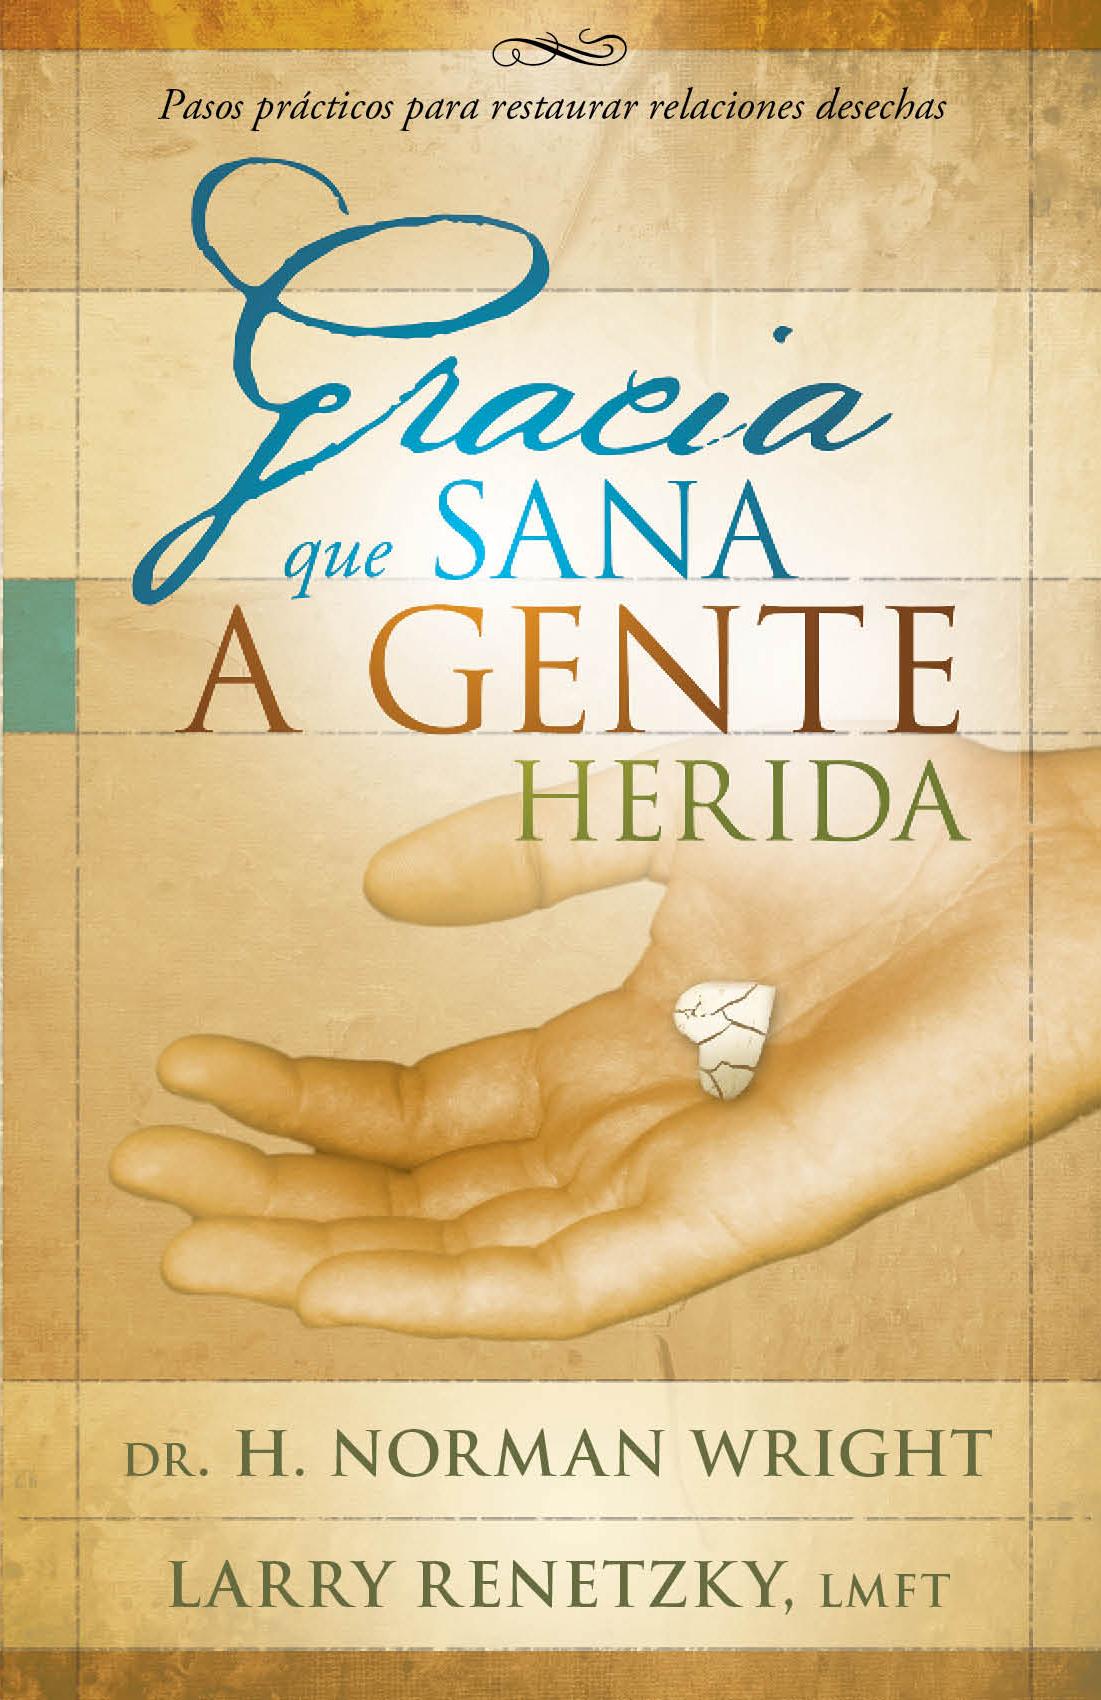 Restaurar Matrimonio Biblia : Gracia que sana a gente herida pasos prácticos para